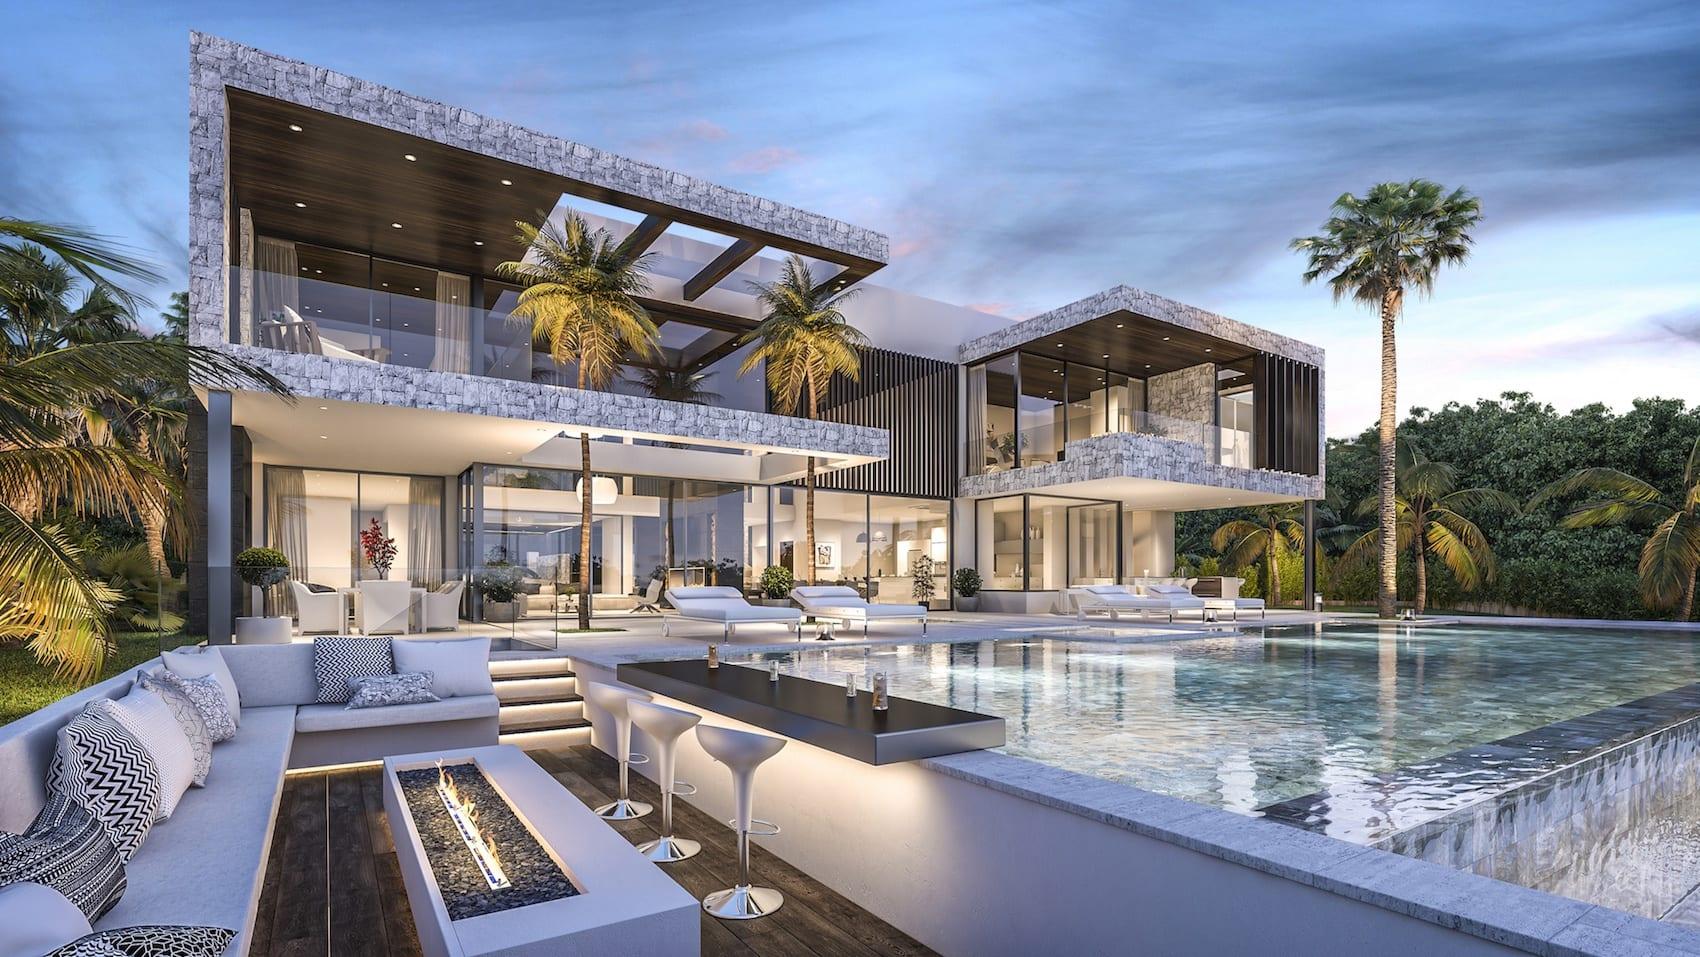 benahavis moderne villa bereit 10 monate. Black Bedroom Furniture Sets. Home Design Ideas